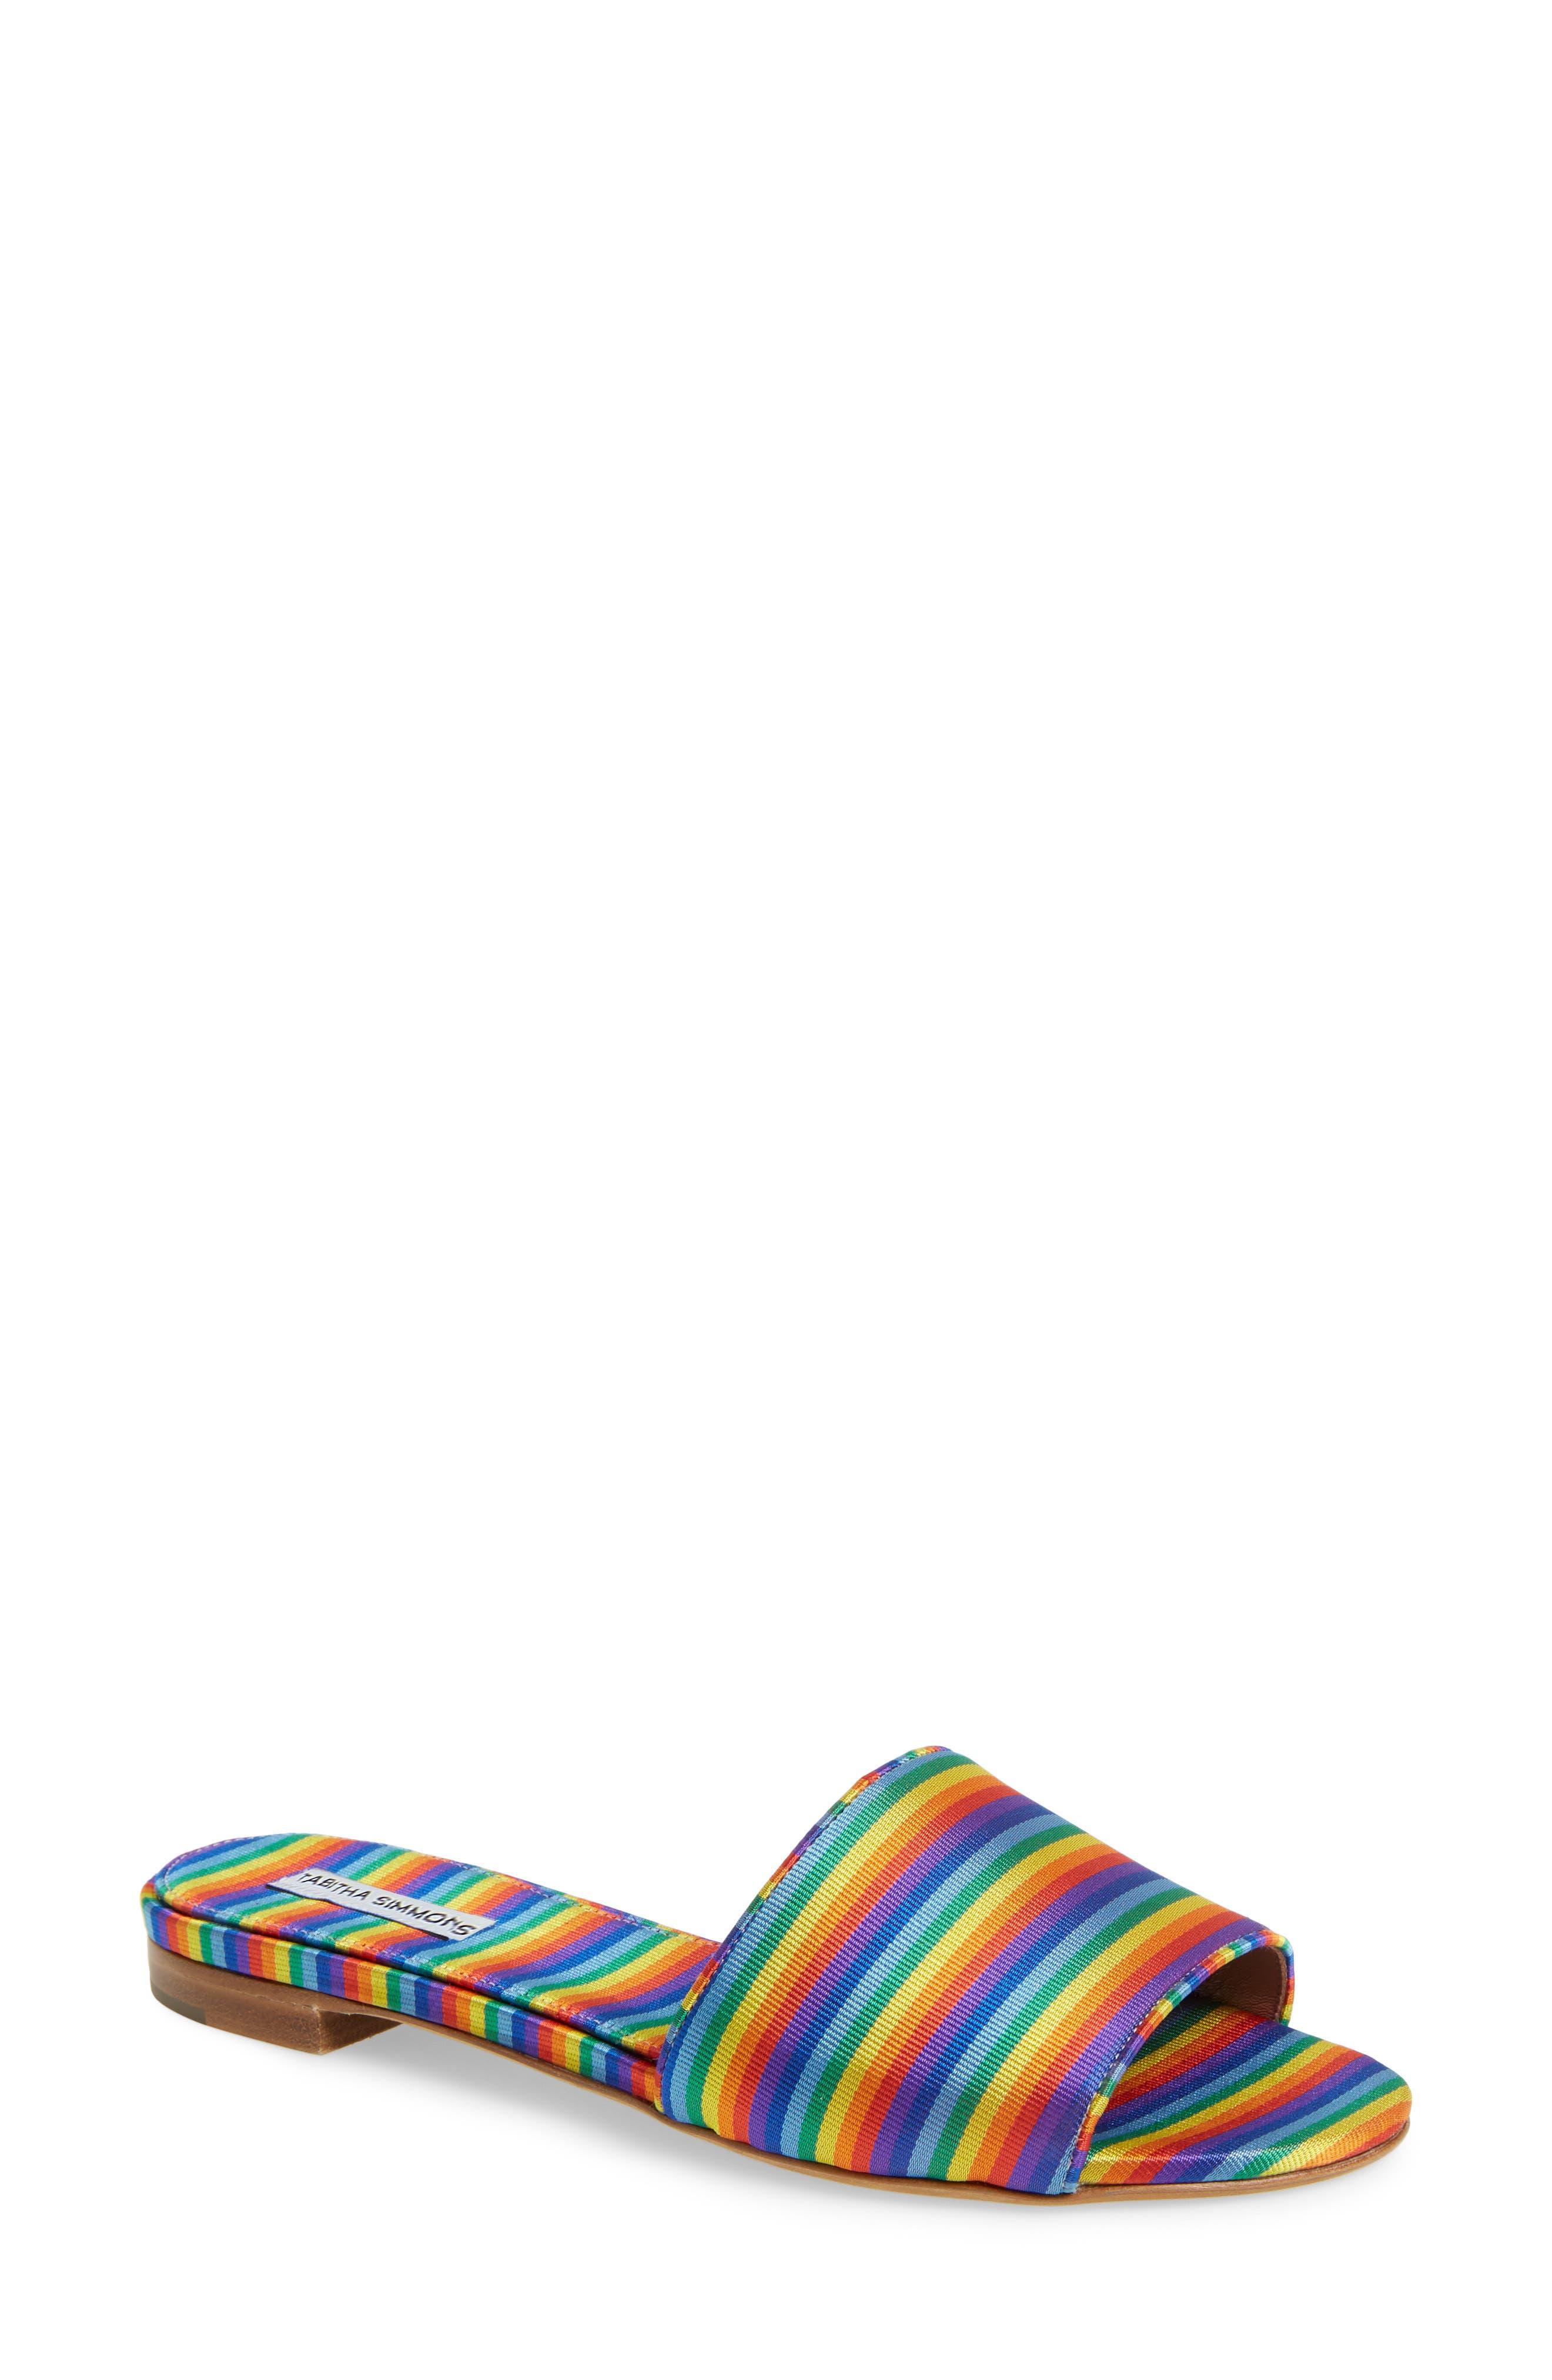 Sprinkles Slide Sandal,                             Main thumbnail 1, color,                             Rainbow